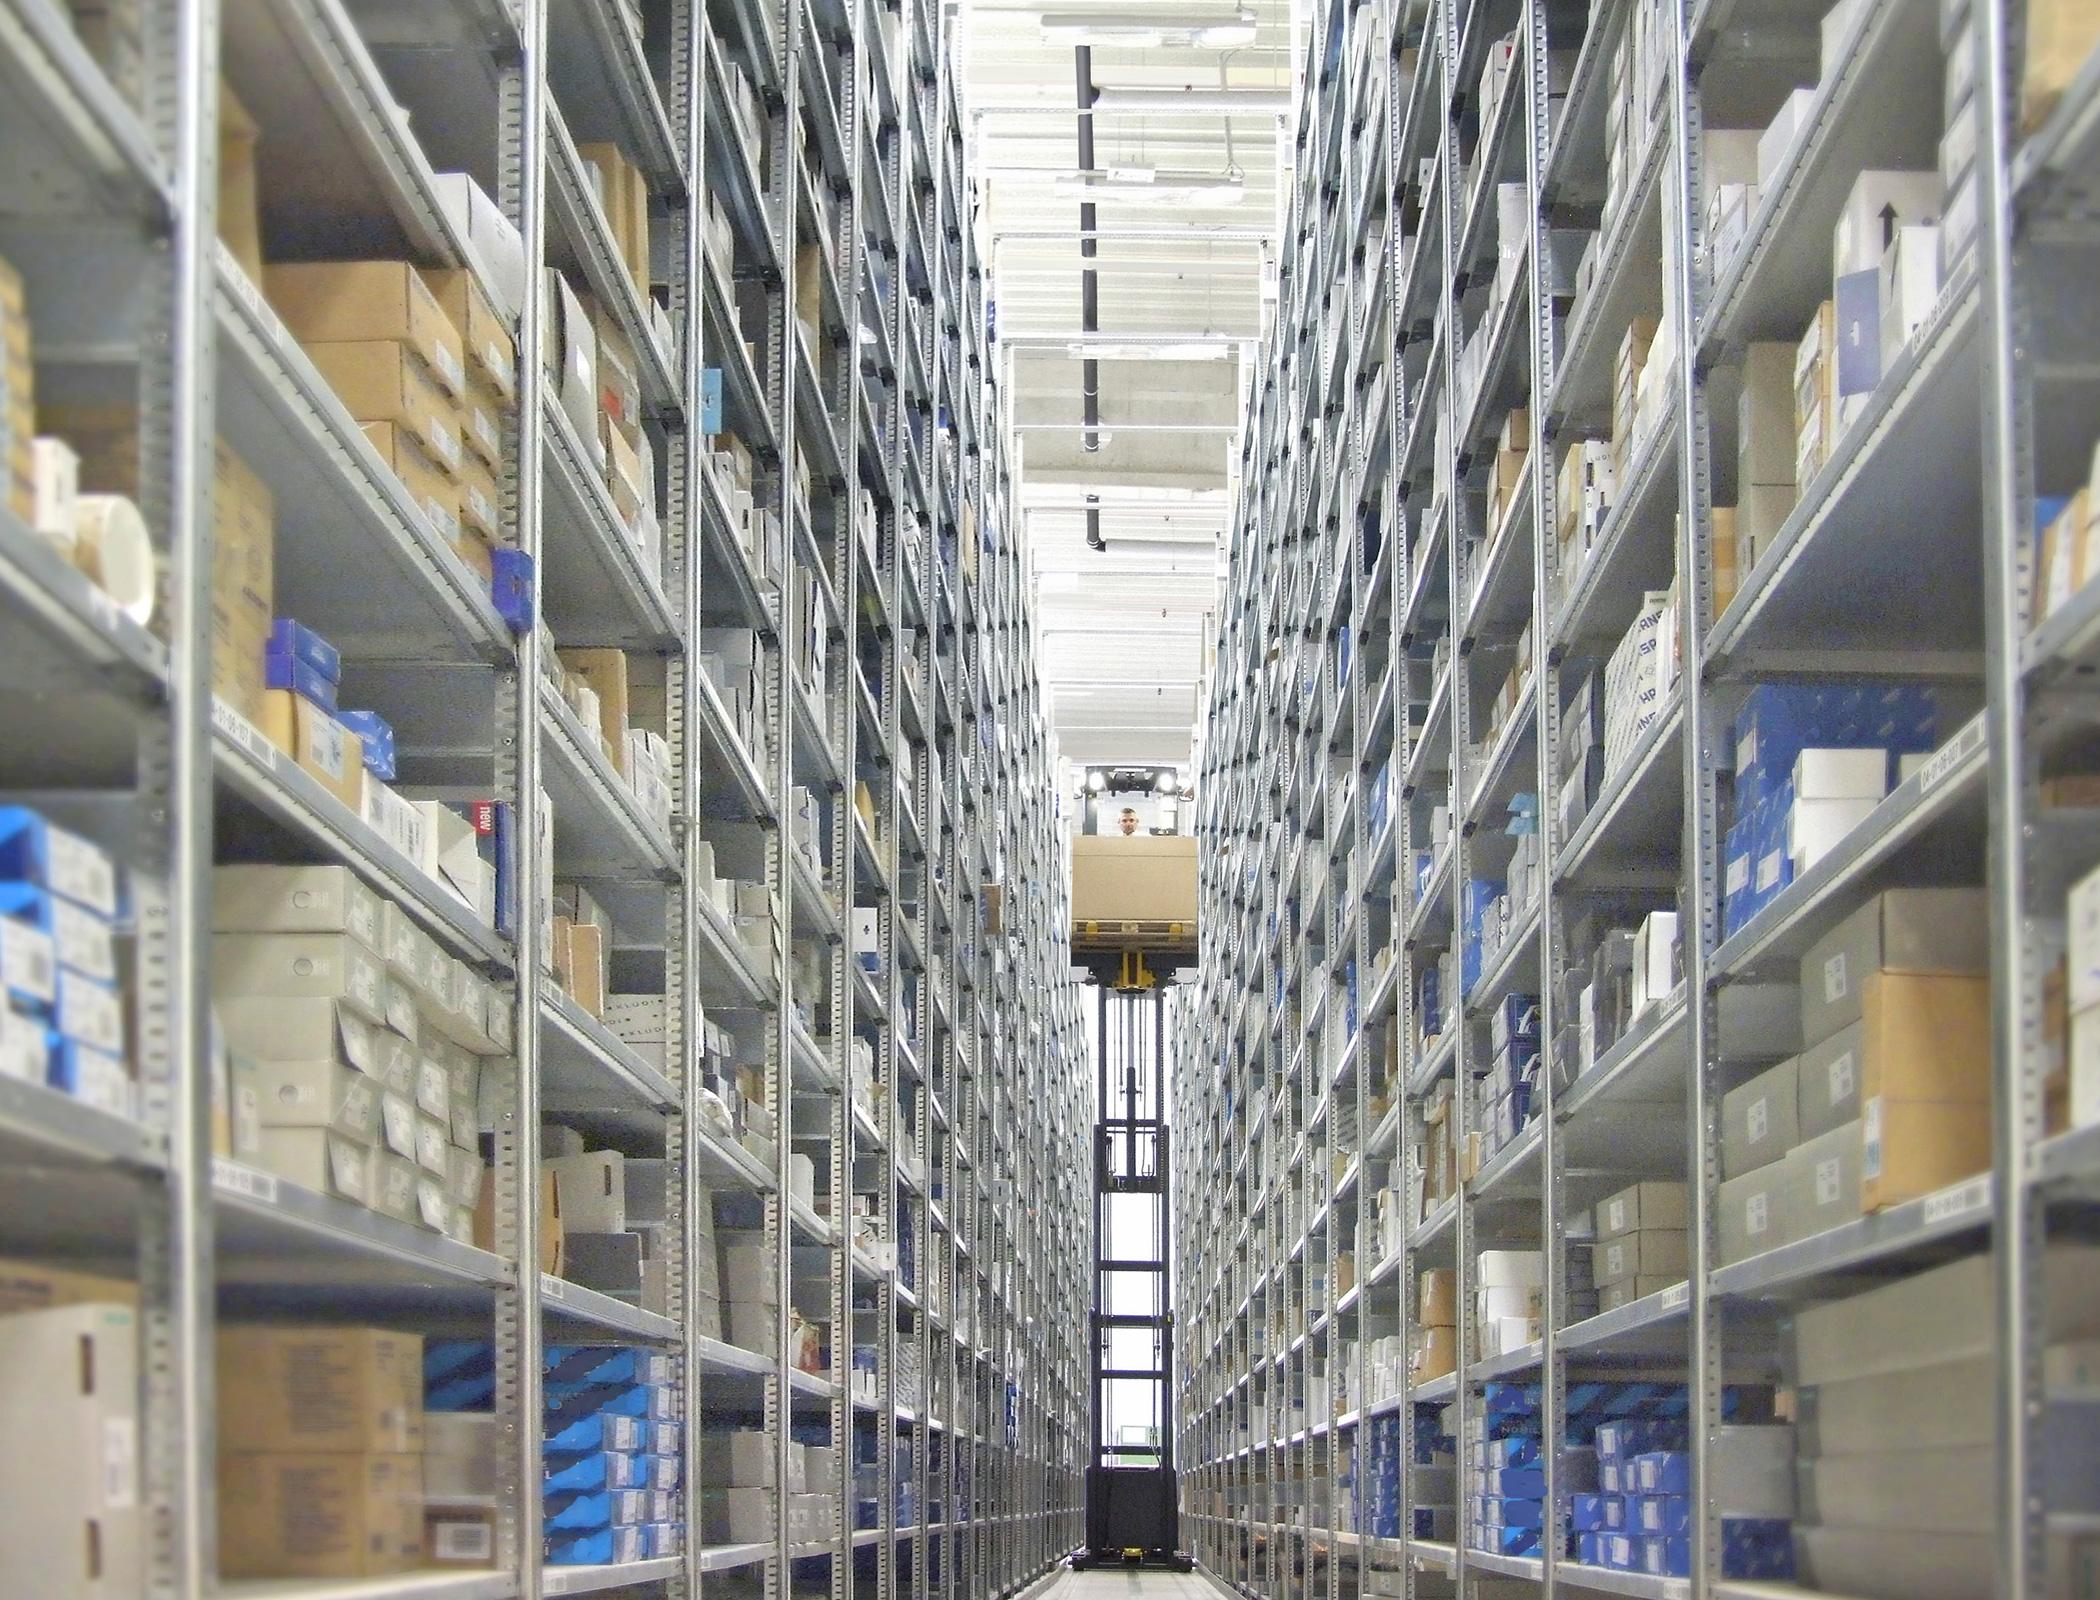 reuter badshop umzug des zentrallagers ins neue logistik center reuter pressemitteilung. Black Bedroom Furniture Sets. Home Design Ideas